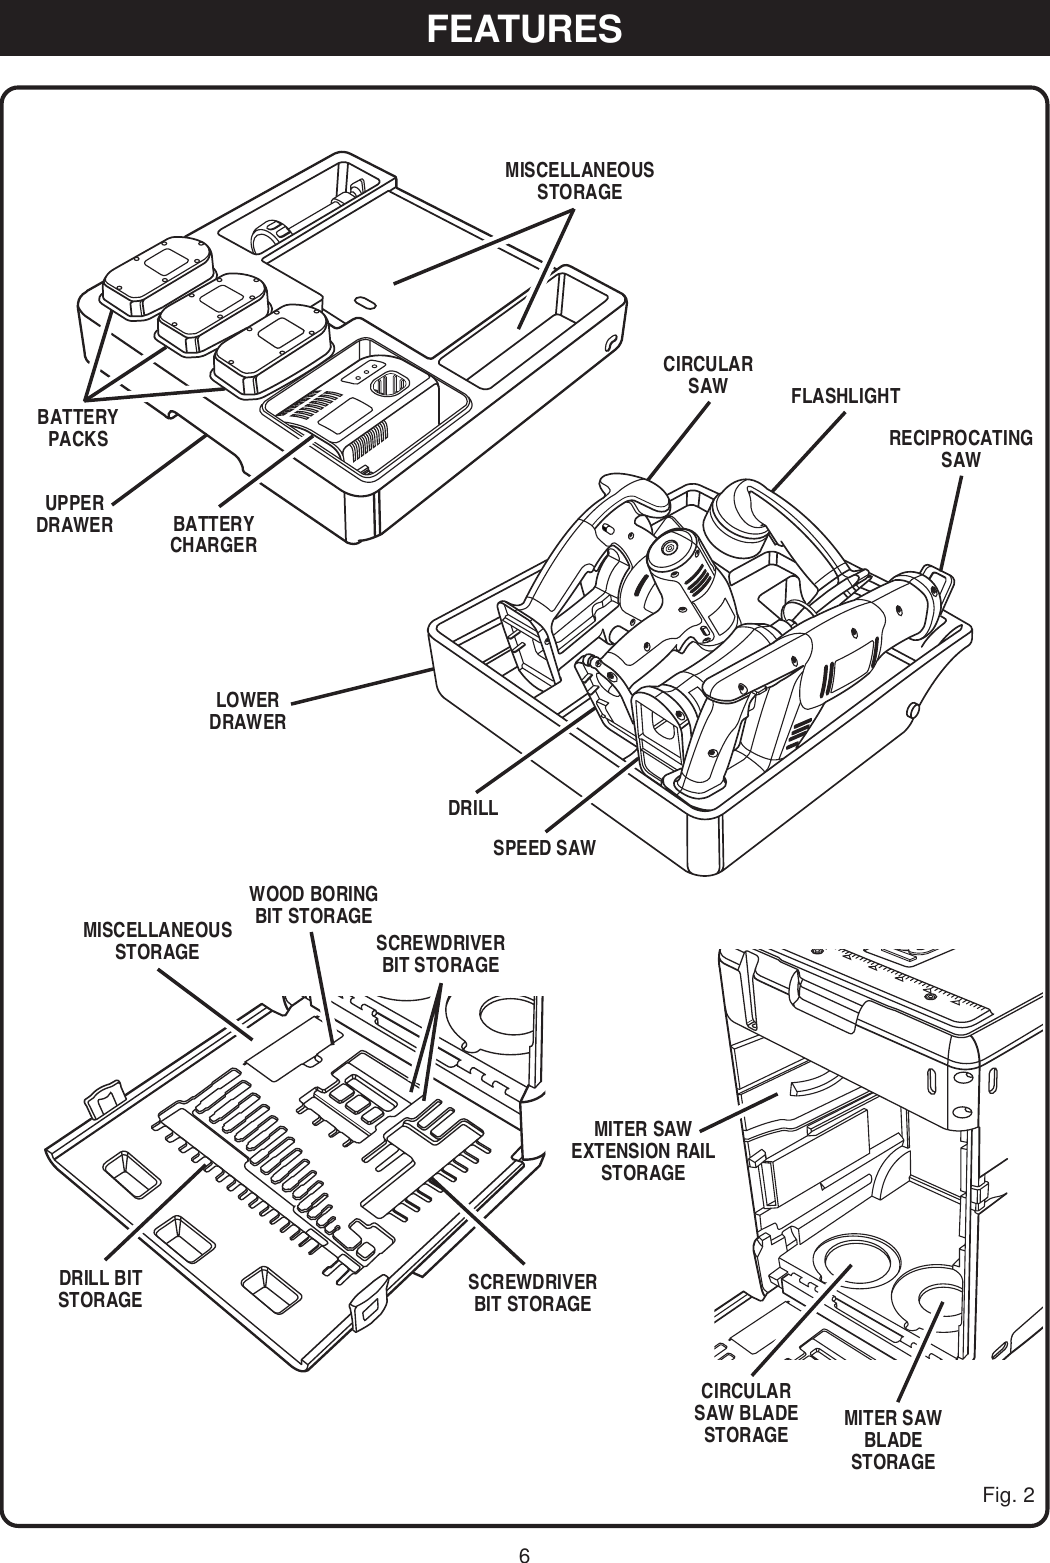 Ryobi Spc18 Mk618K3 Owner S Manual Six_pack_080_eng